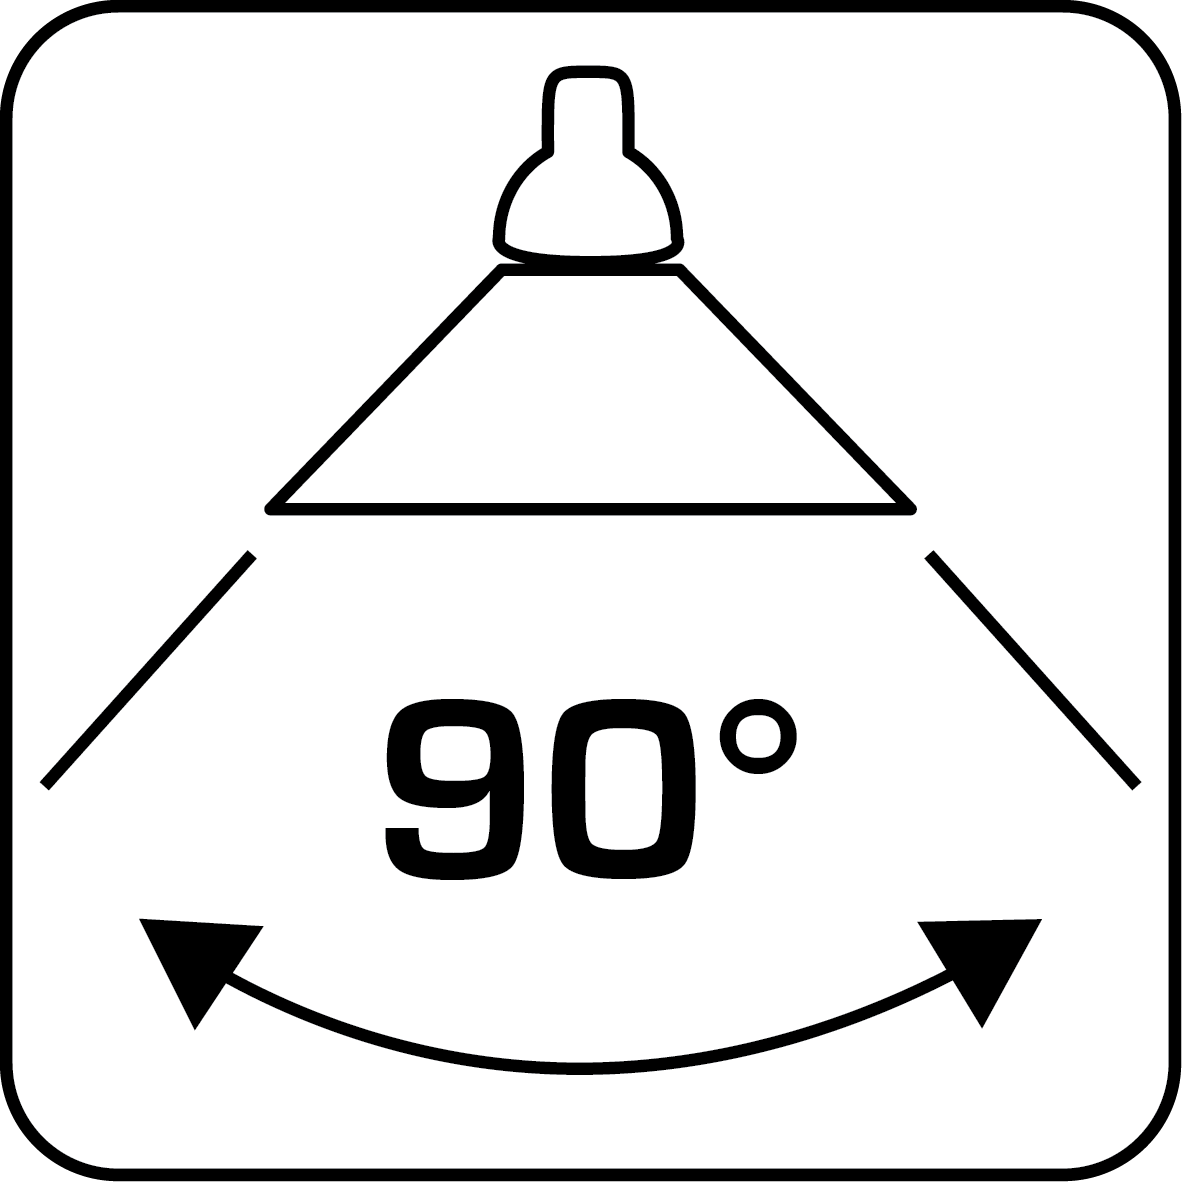 15-spredningsvinkel-90